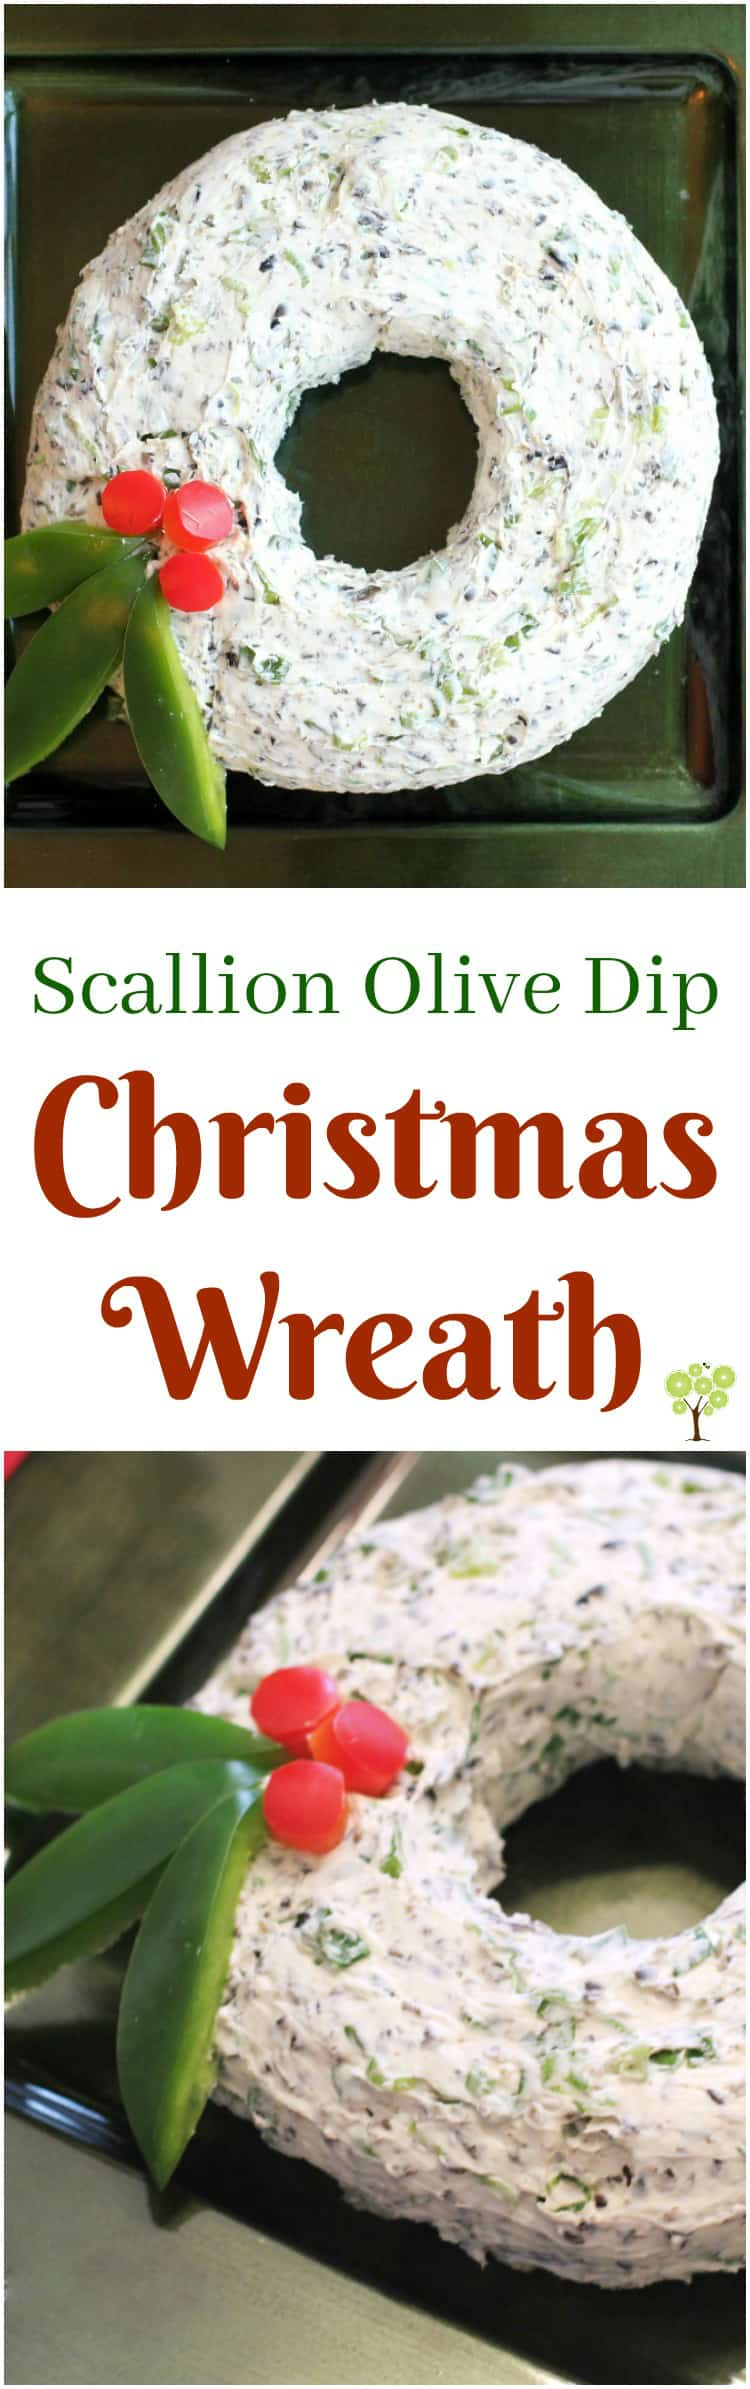 Scallion Olive Dip